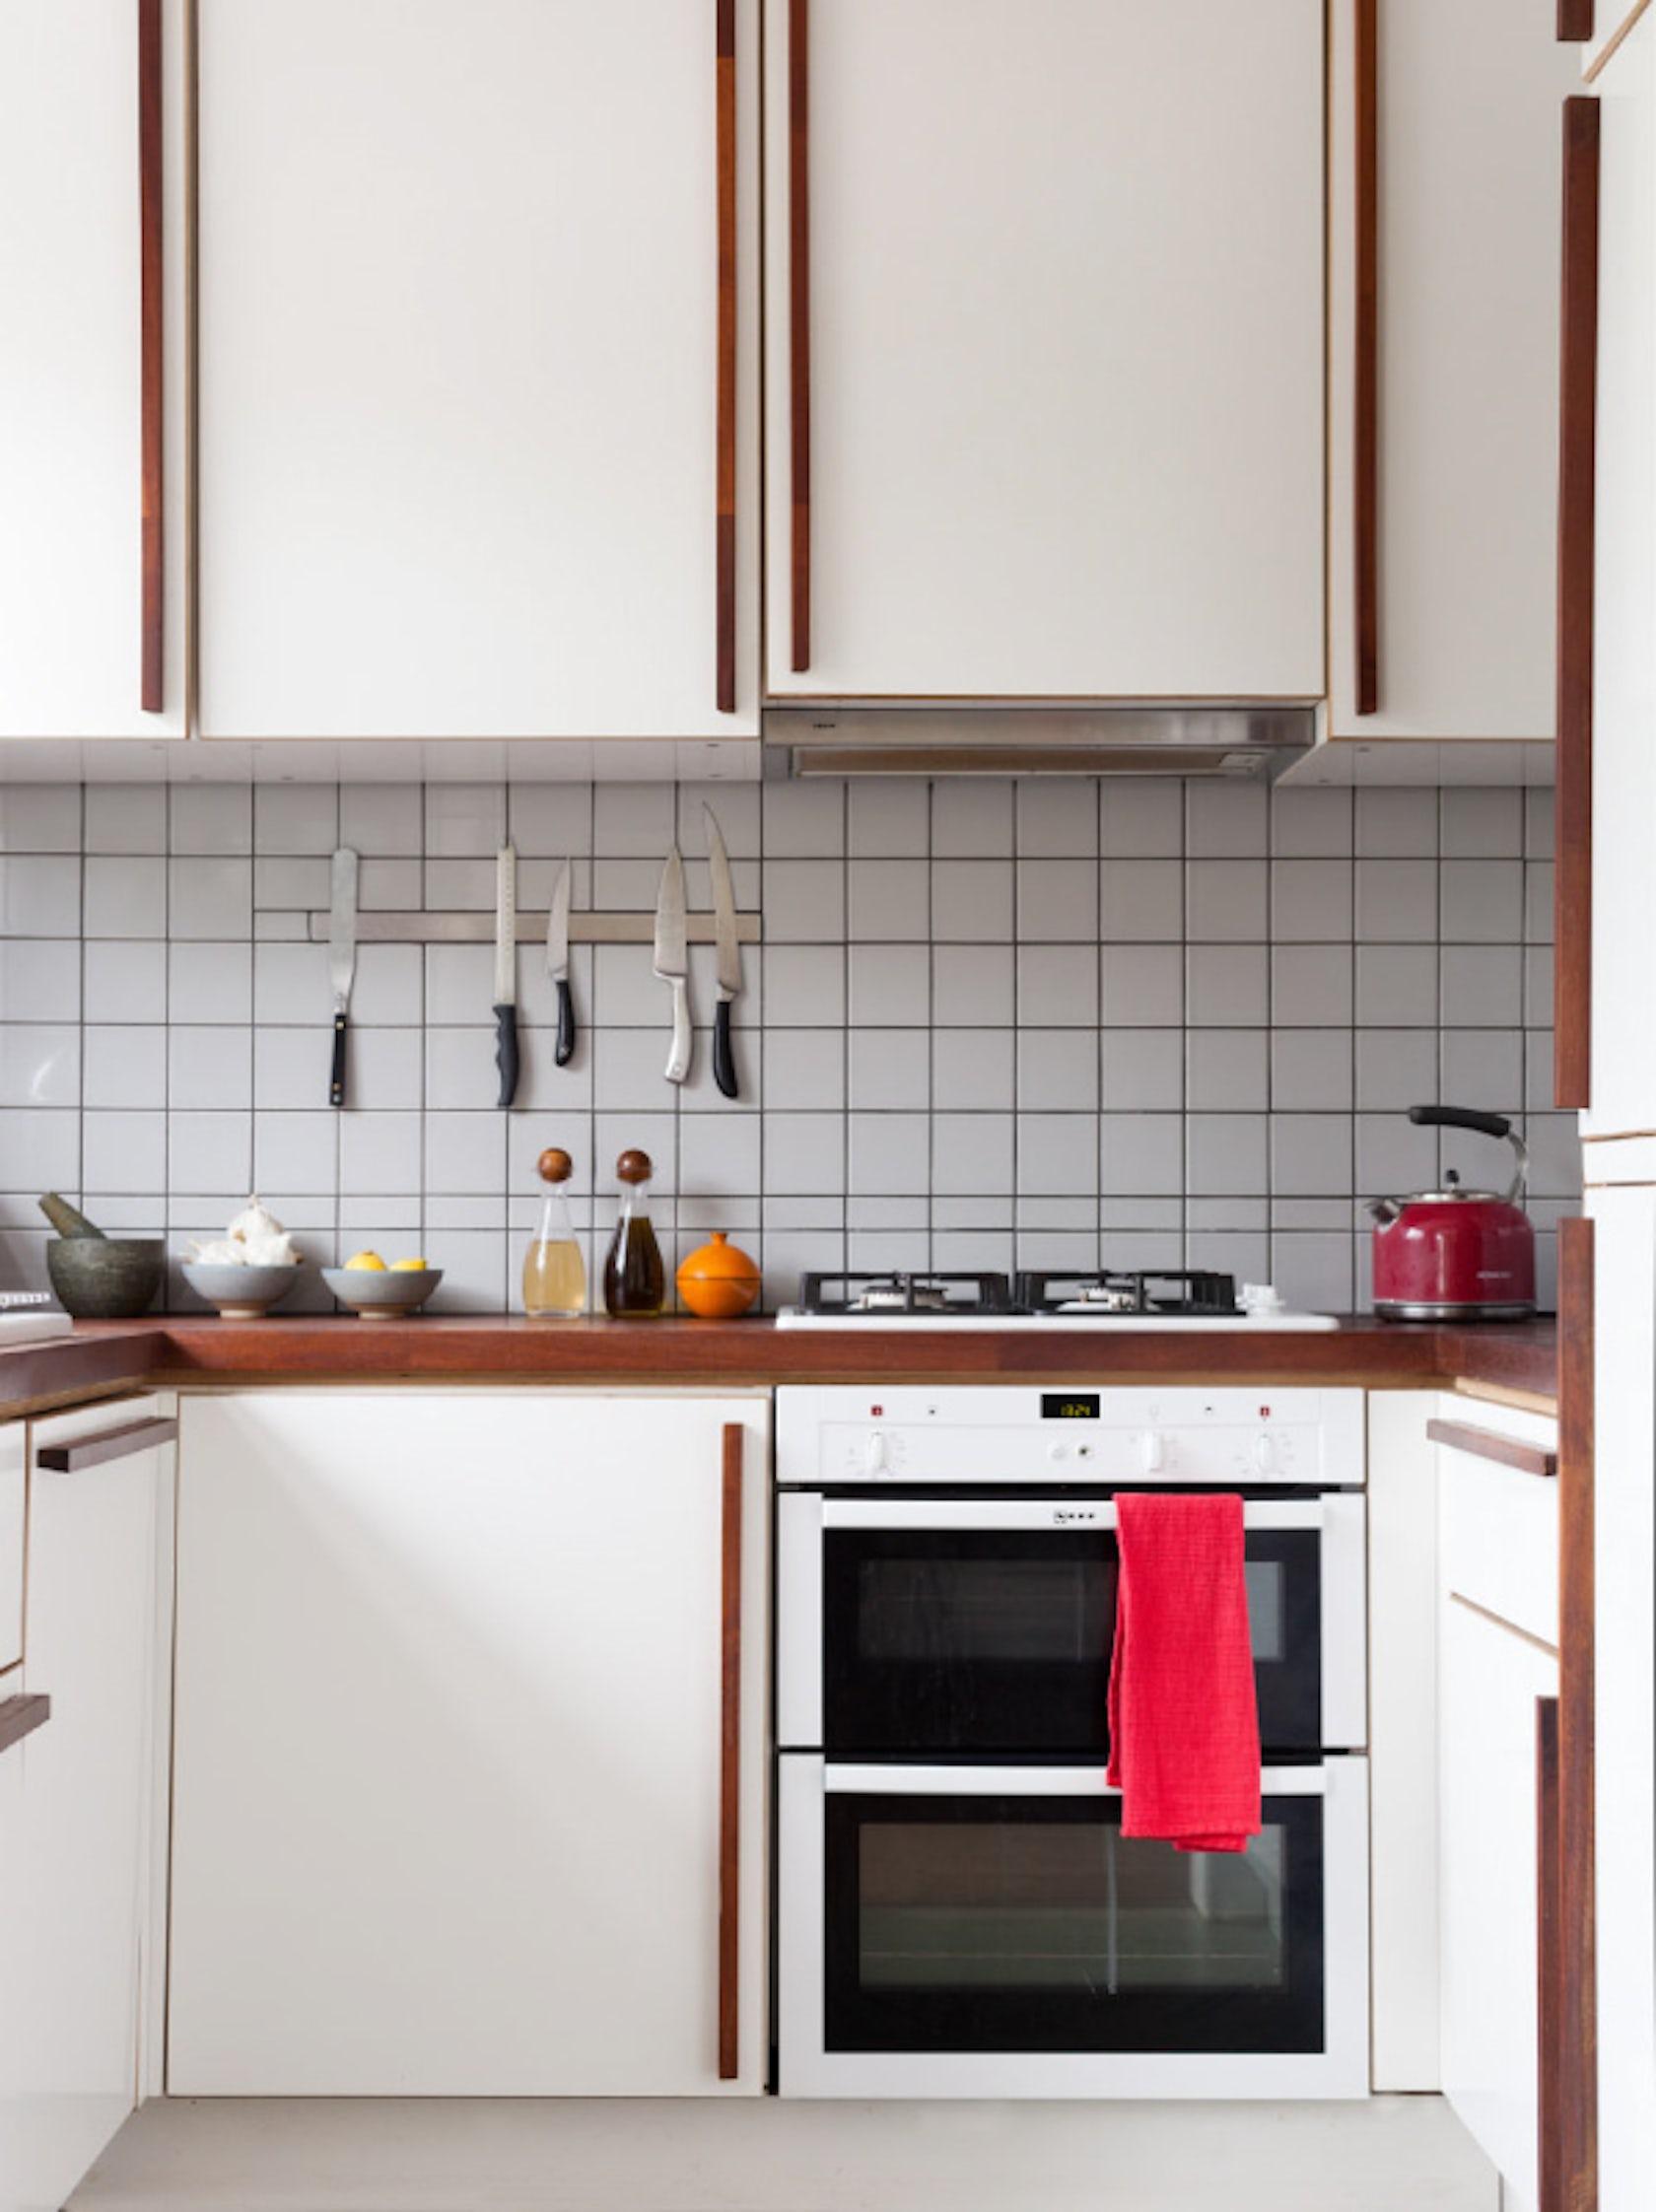 Test Kitchen Phases